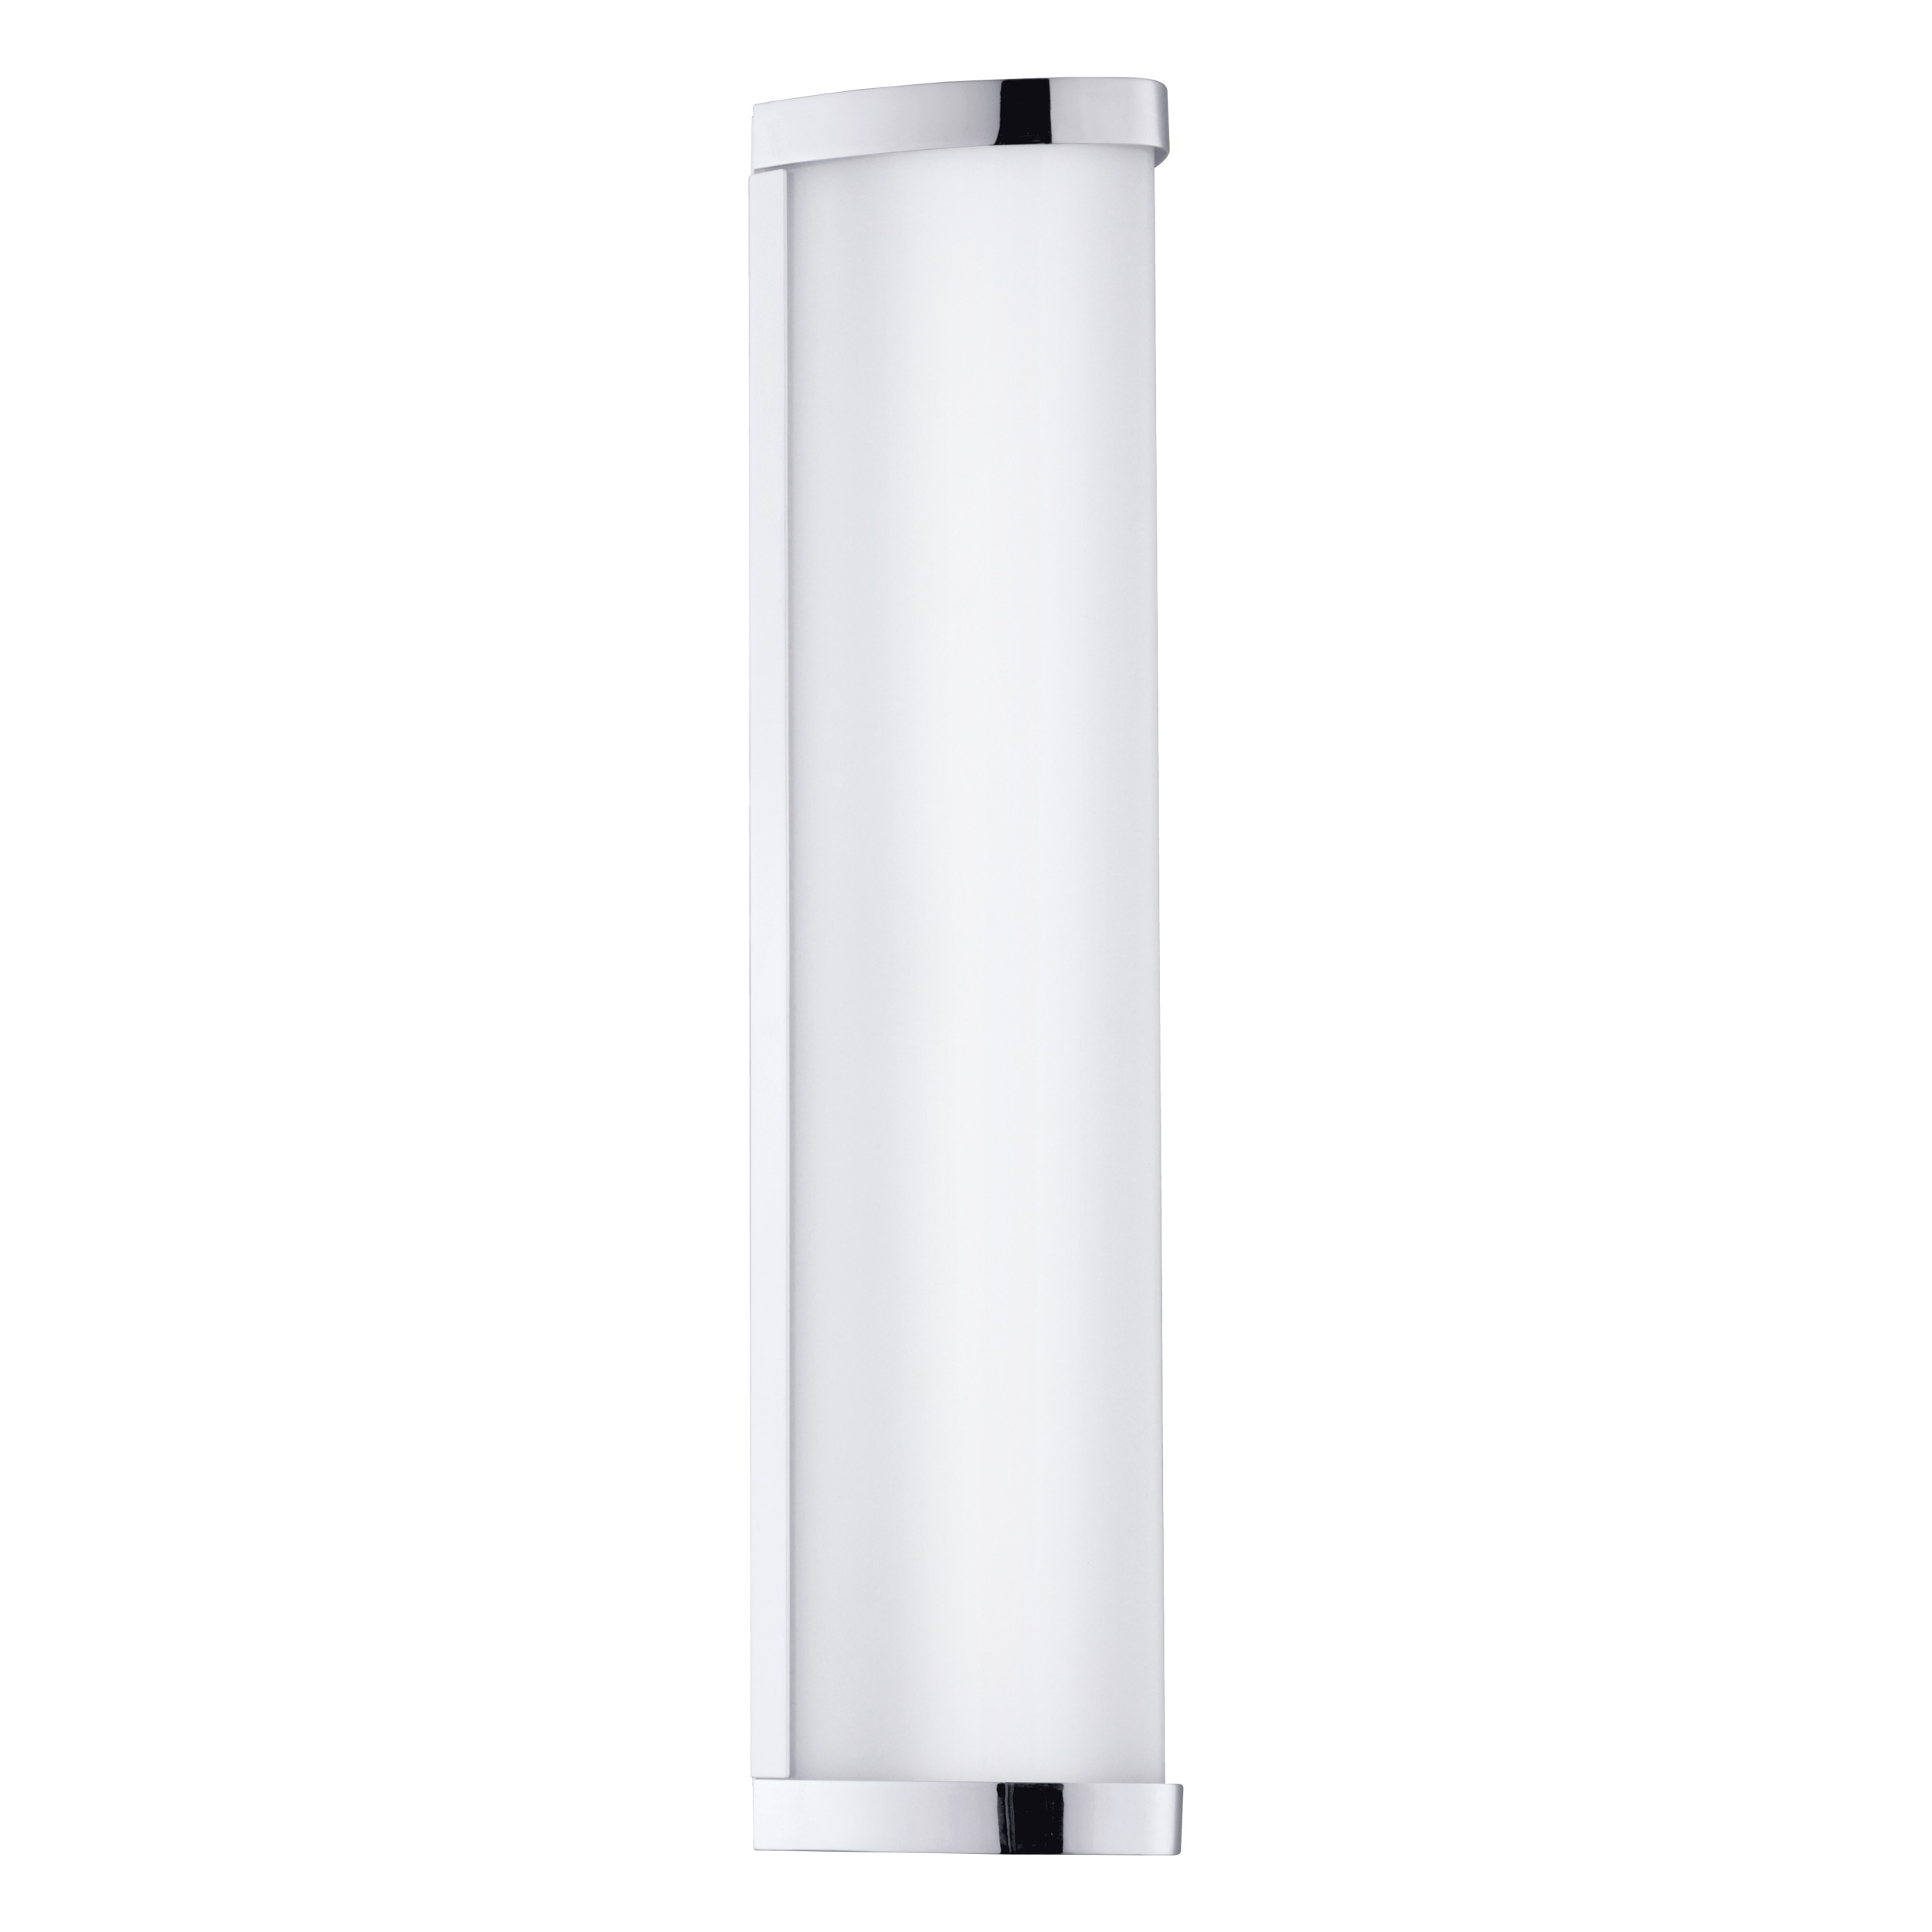 1 Stk LED-Wandleuchte Gita 2 Pro 24,3W 3000K chrom/weiss IP20 LI64049---